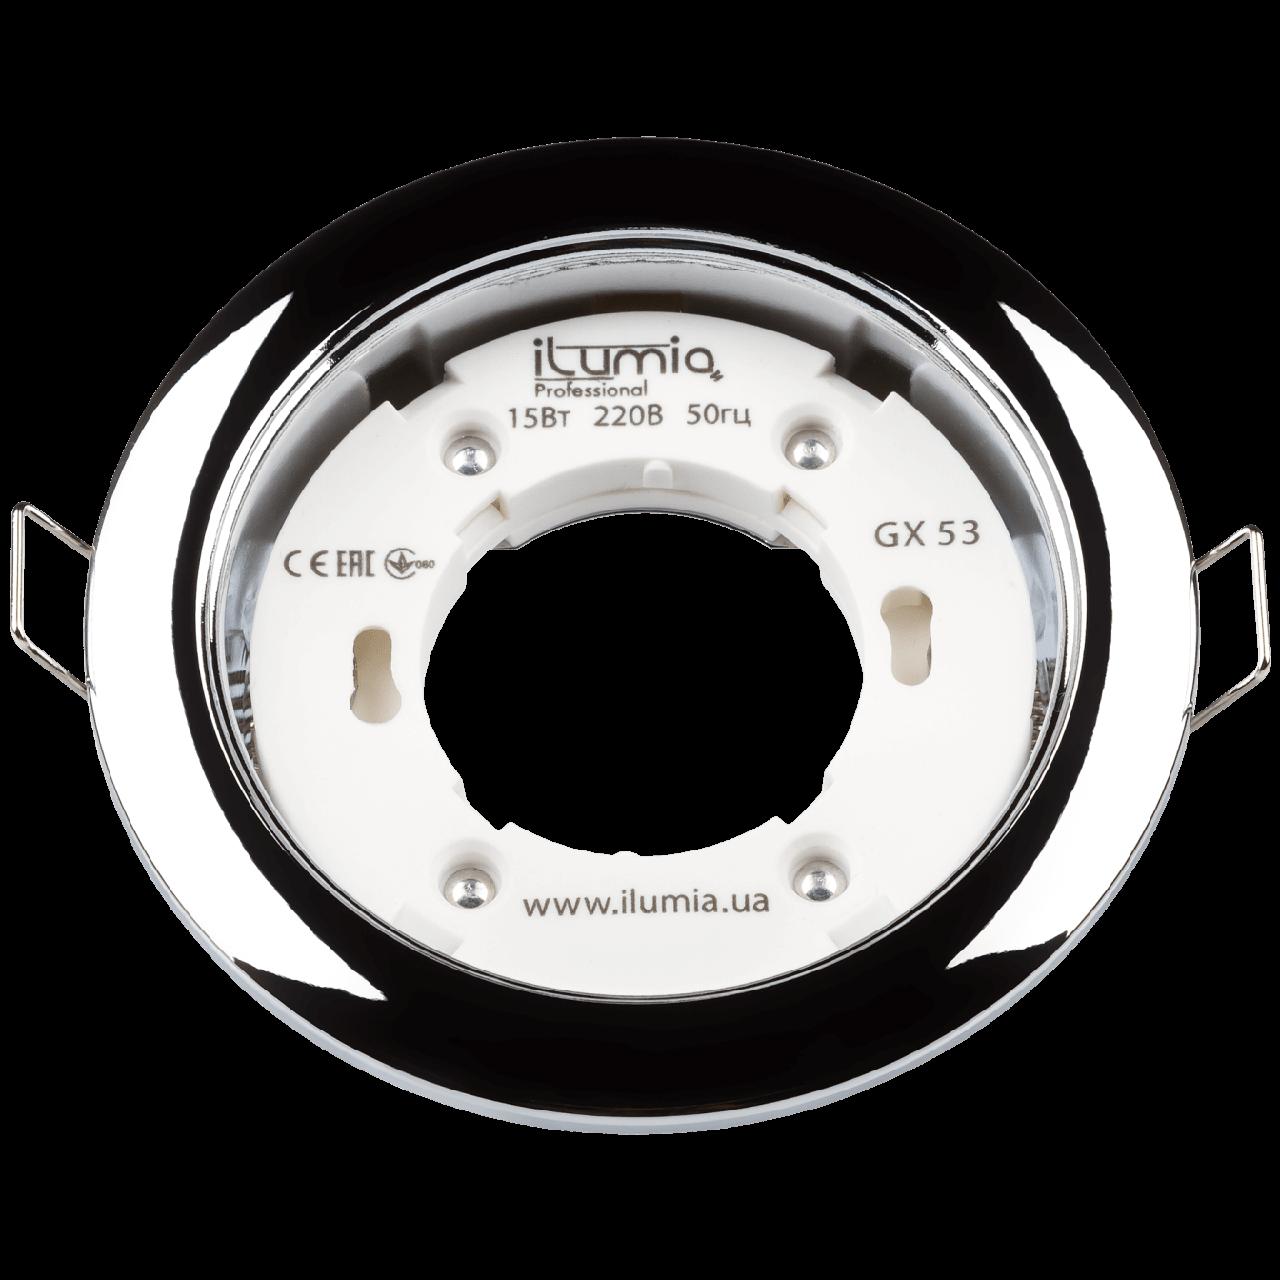 Светильник Ilumia Хром 90mm под лампу GX53 круг врезной (051)